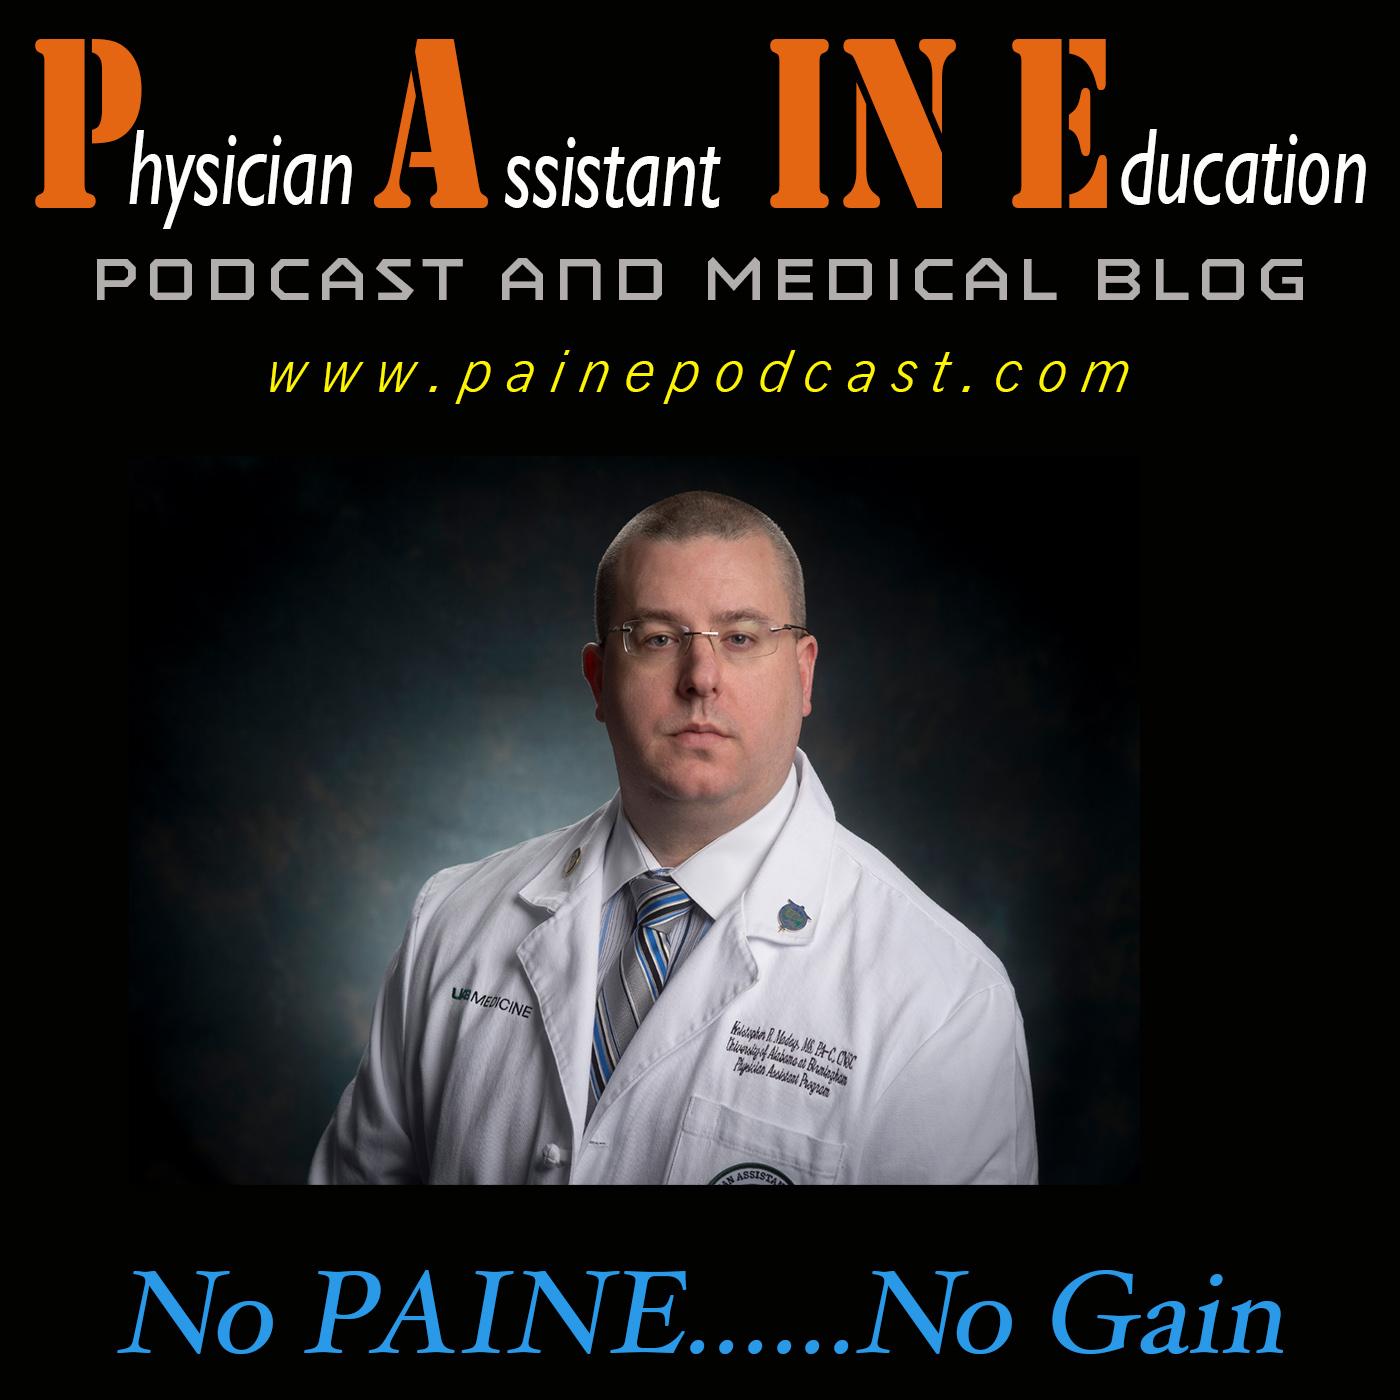 PAINE Podcast